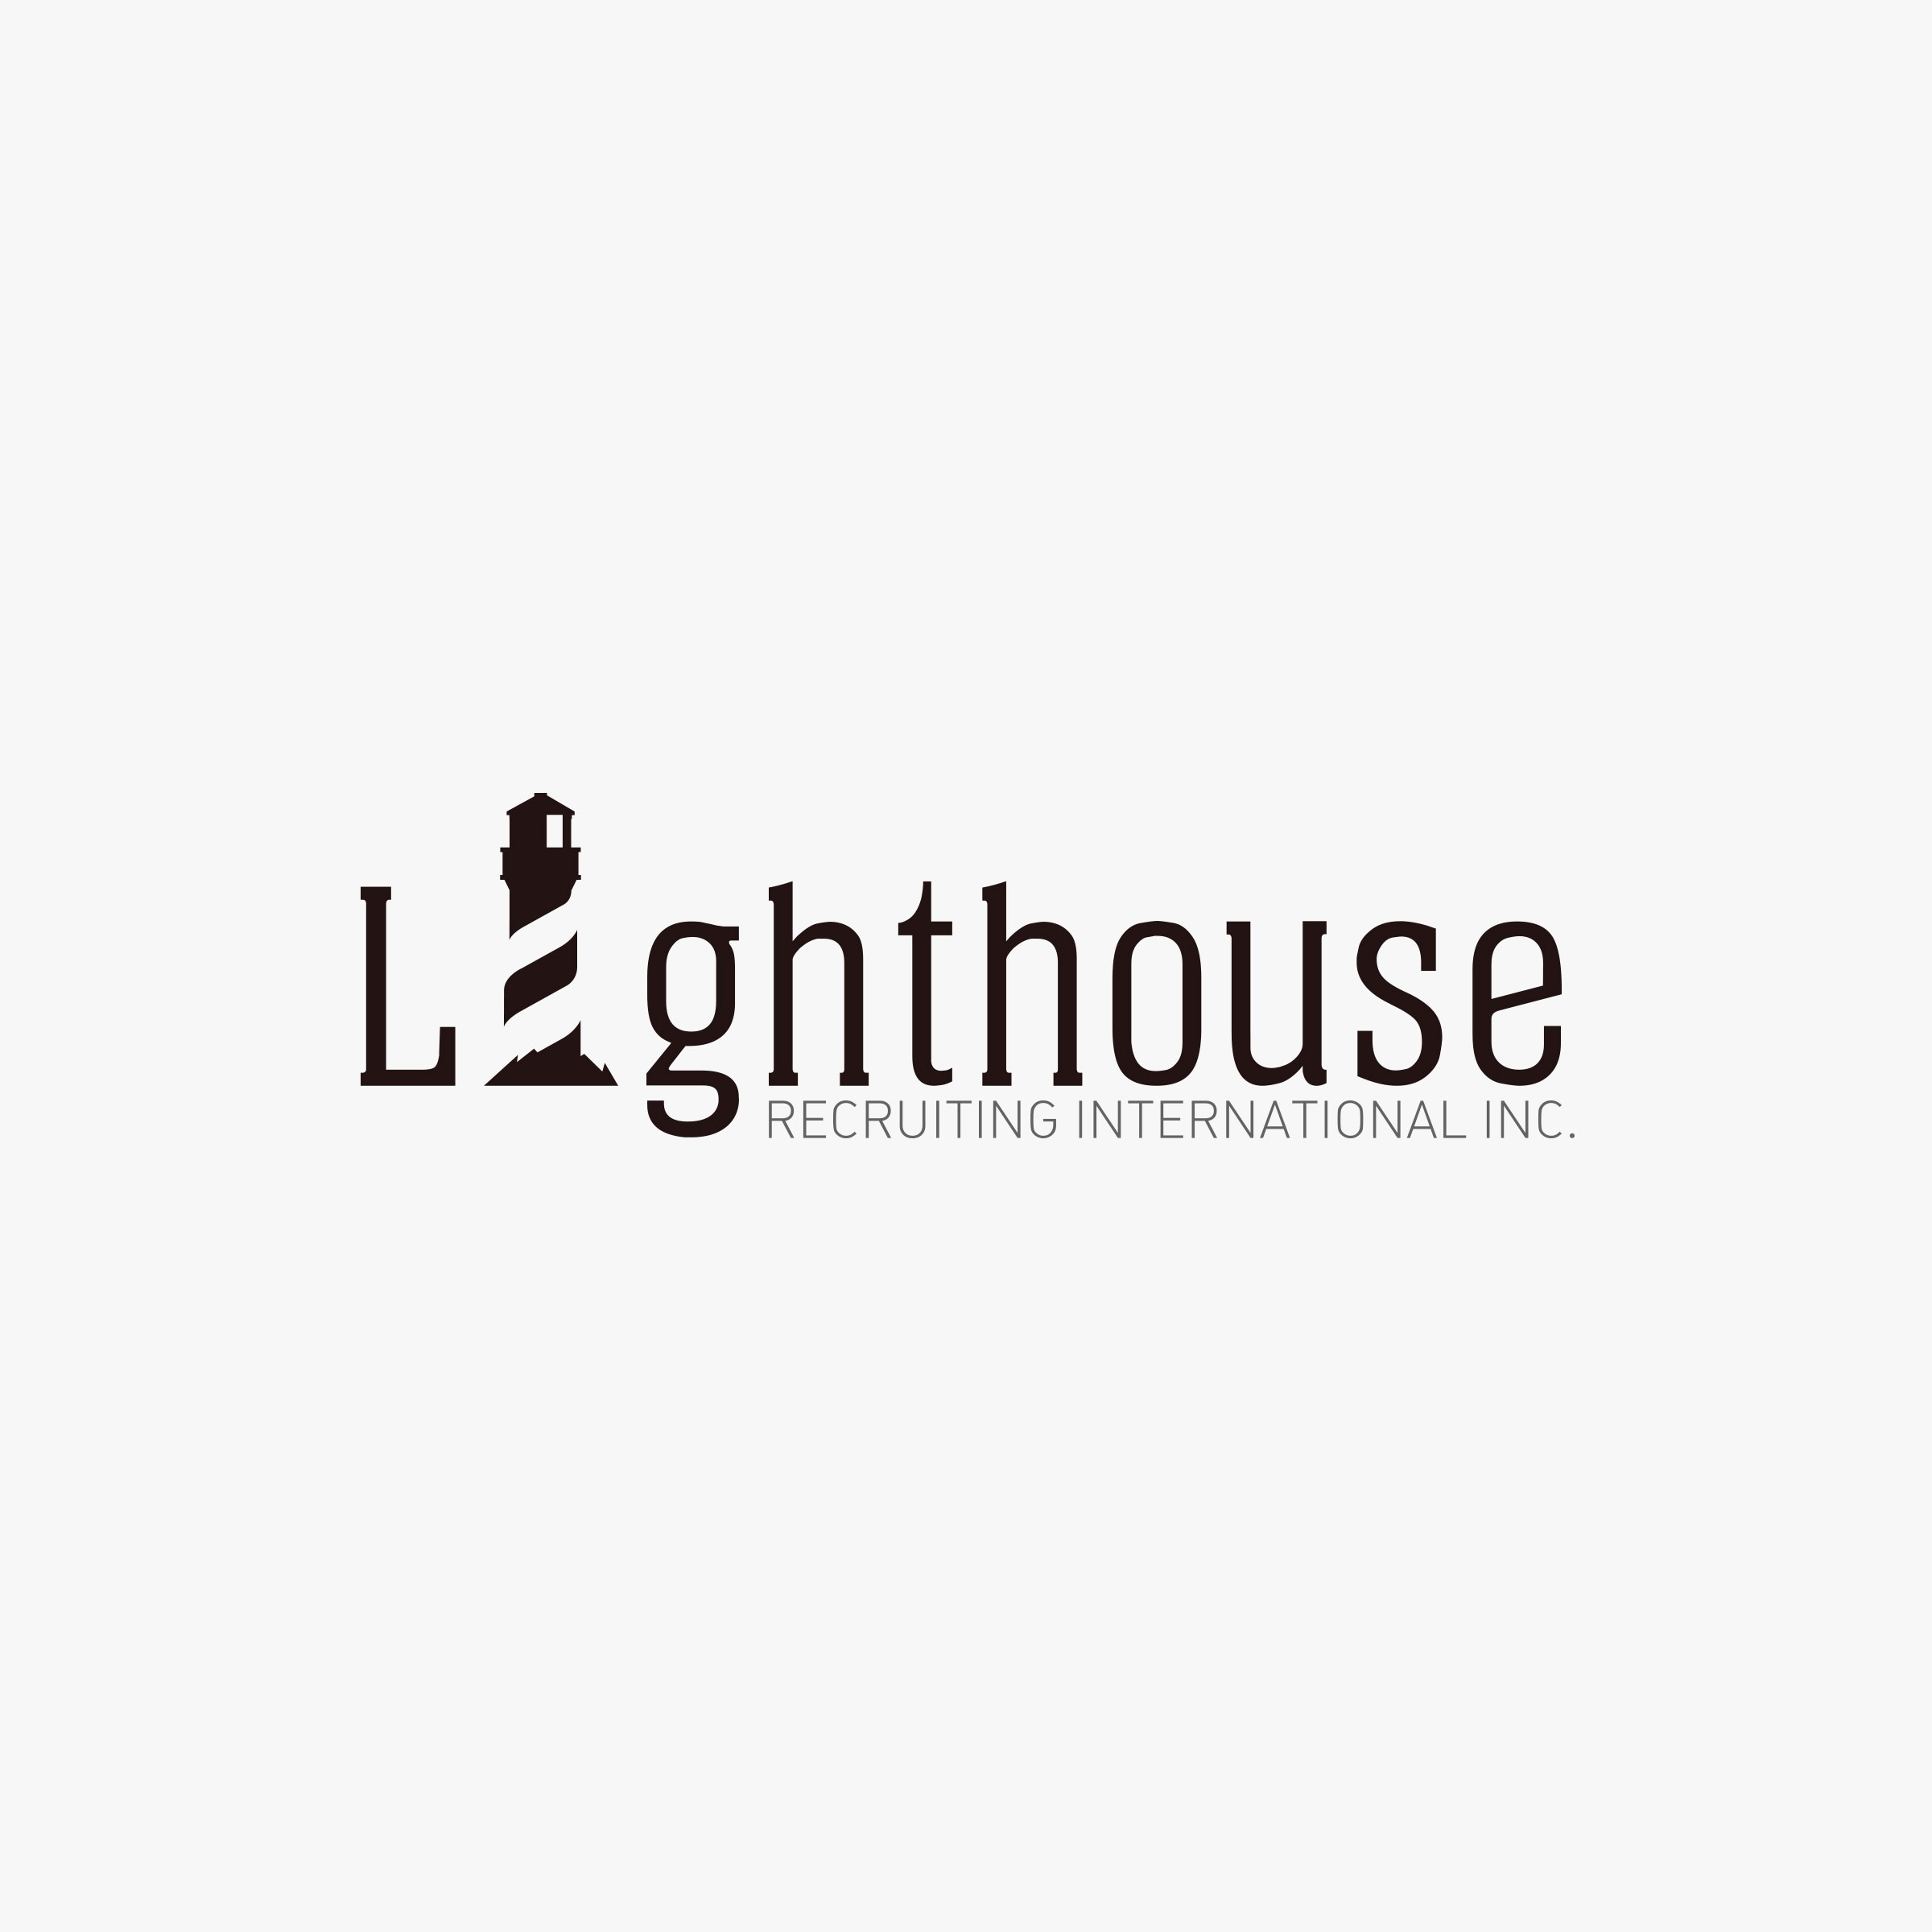 lighthouse-logo-design-by-create.jpg